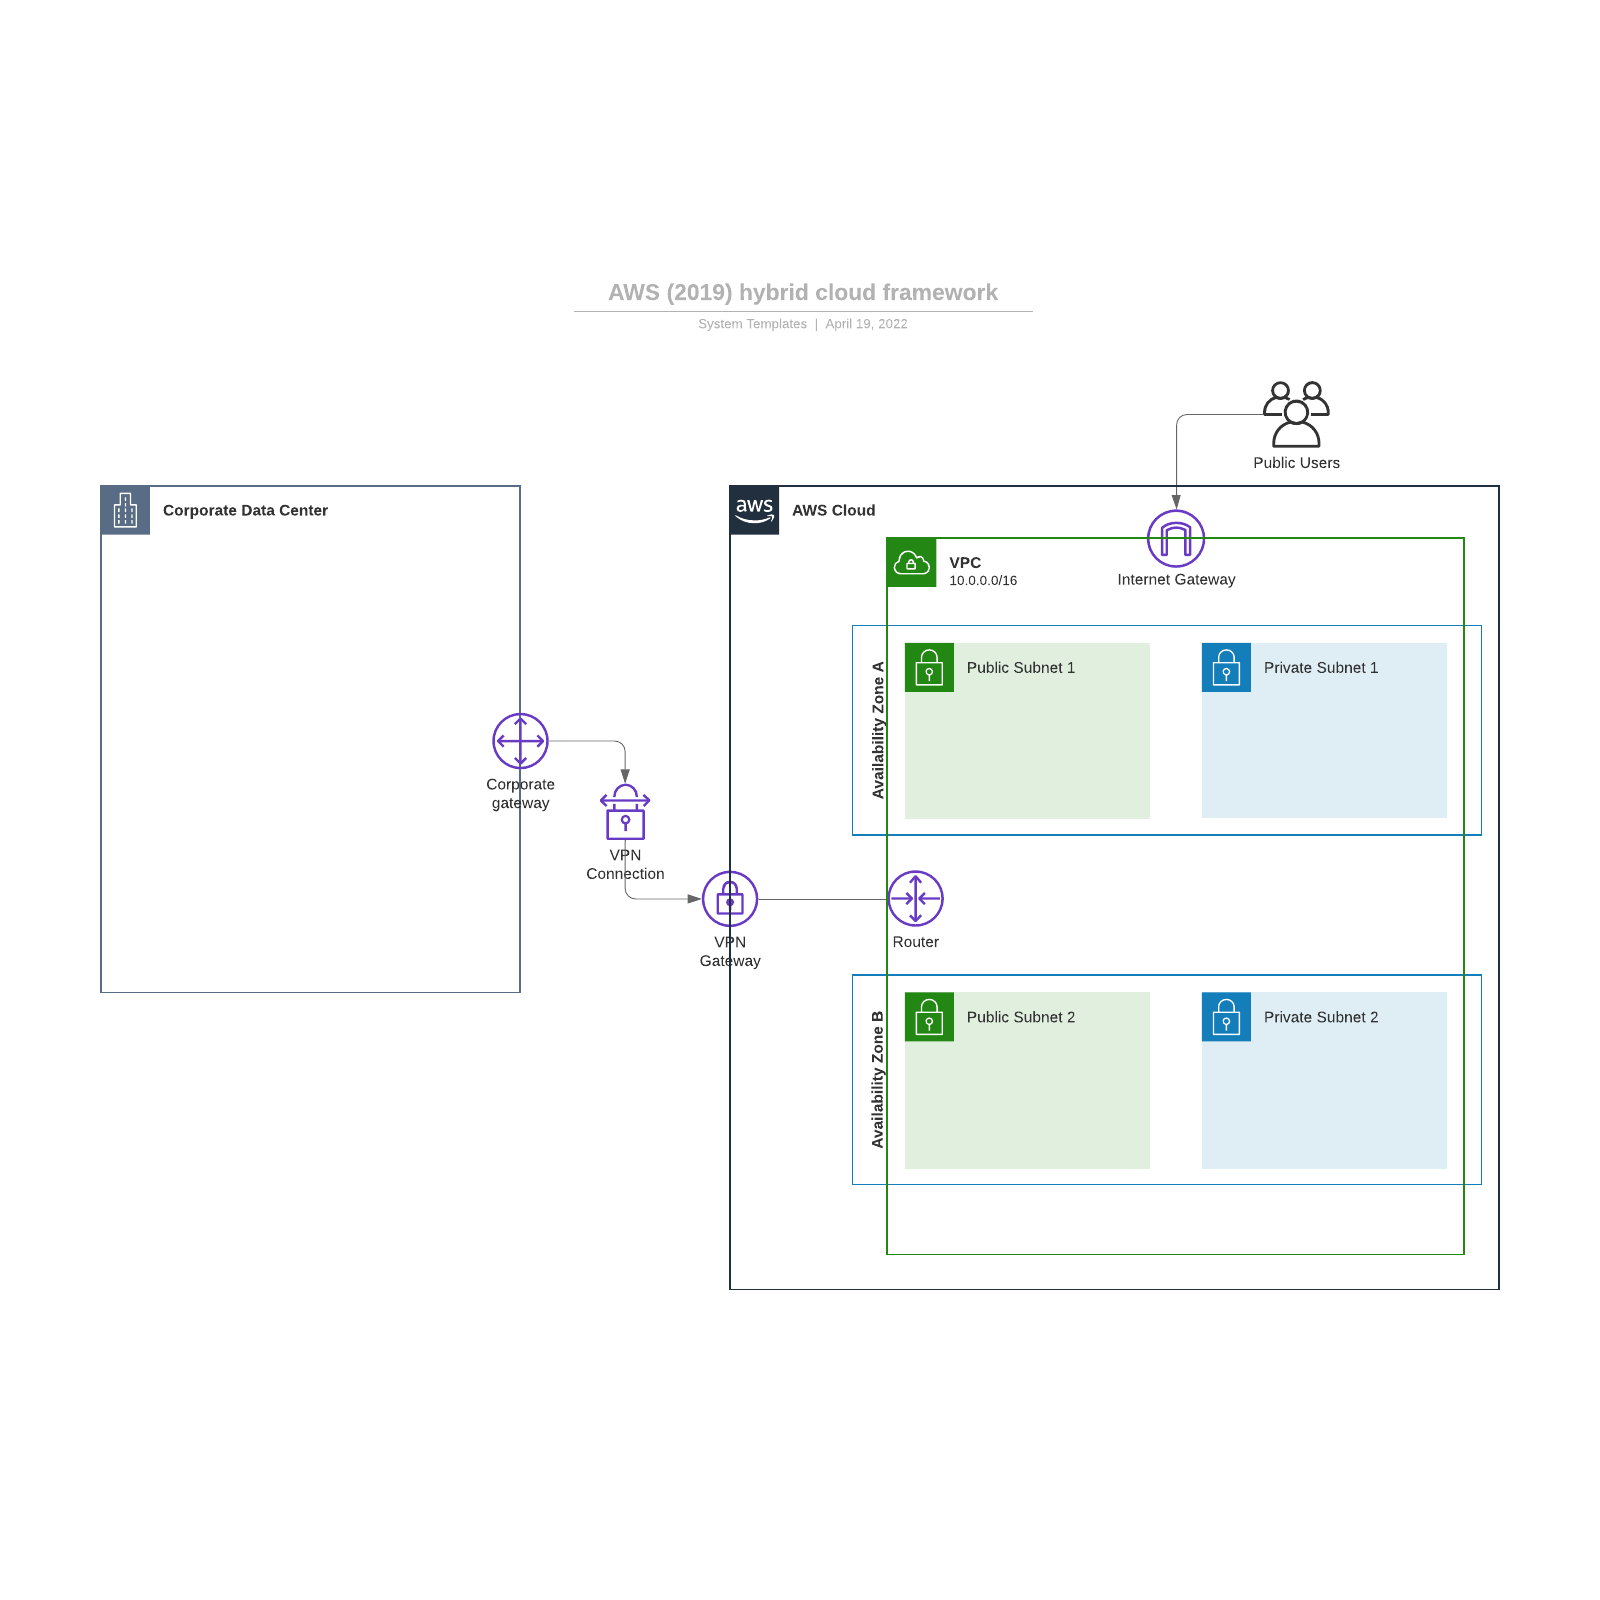 AWS (2019) hybrid cloud framework